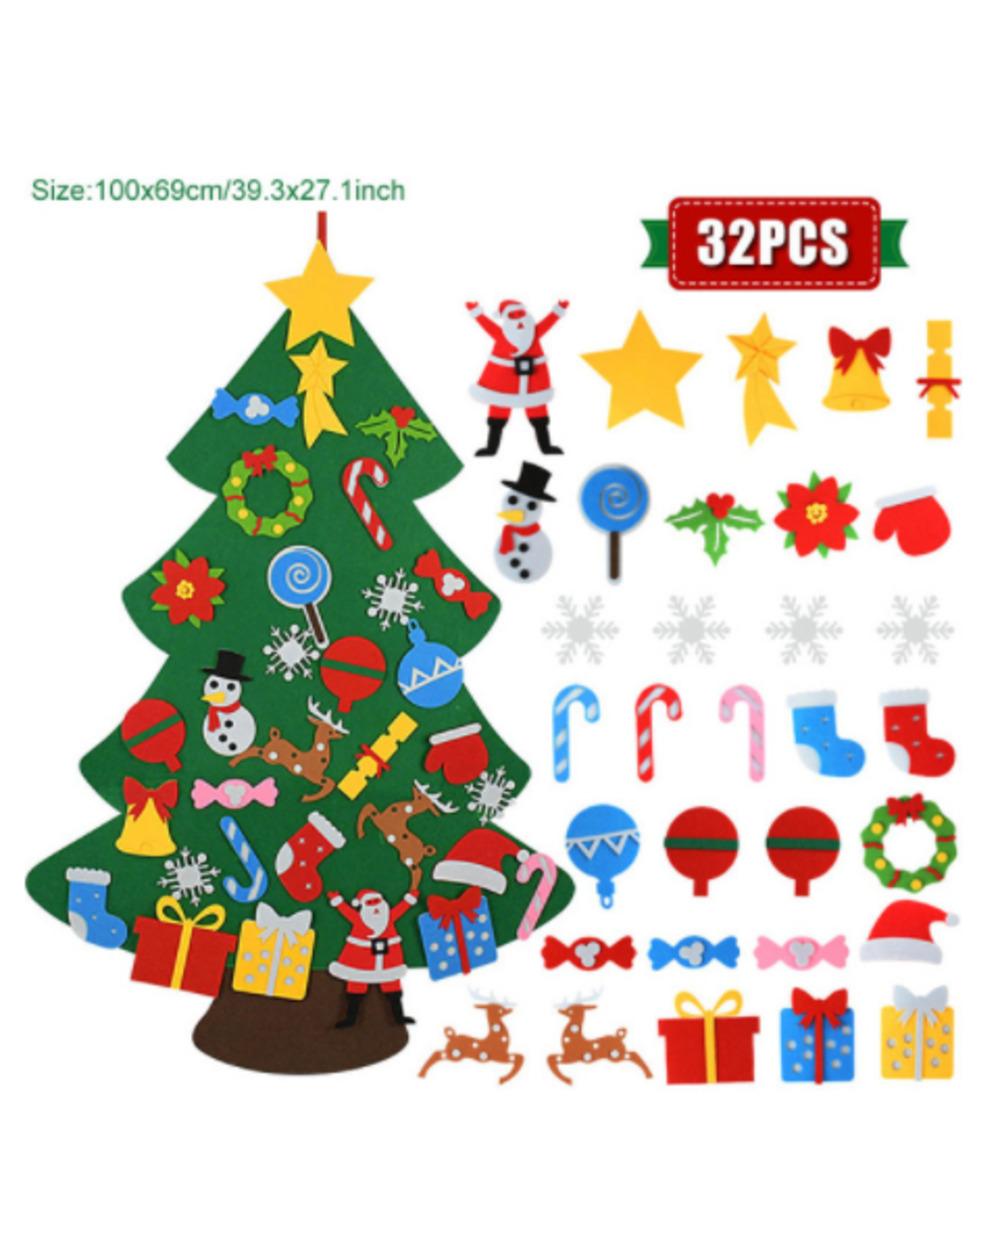 The Felt Christmas Tree Felt Christmas Tree 1